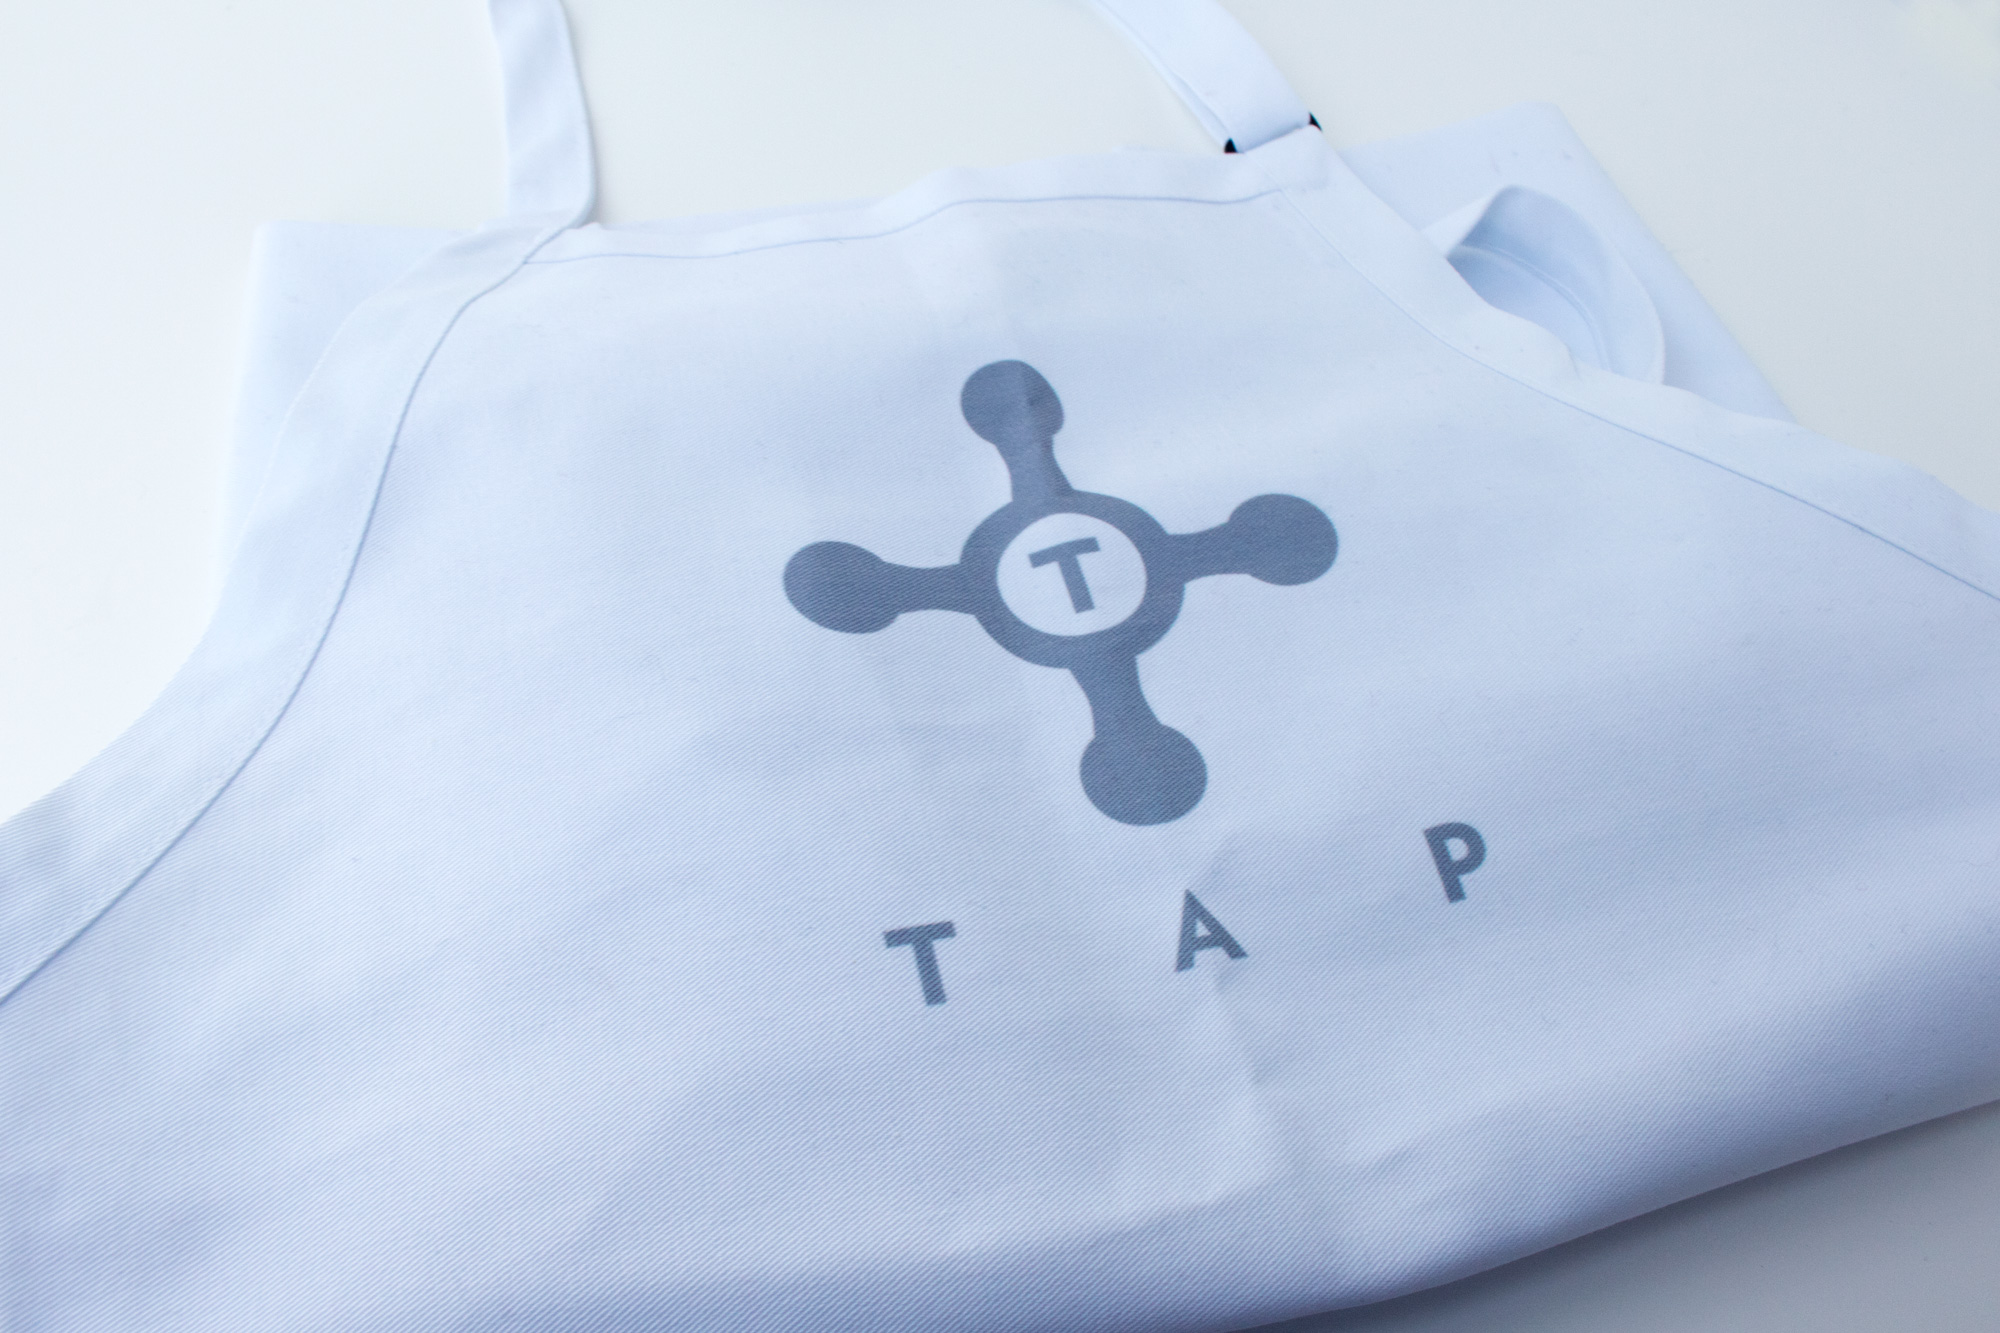 TAP-photo10.jpg